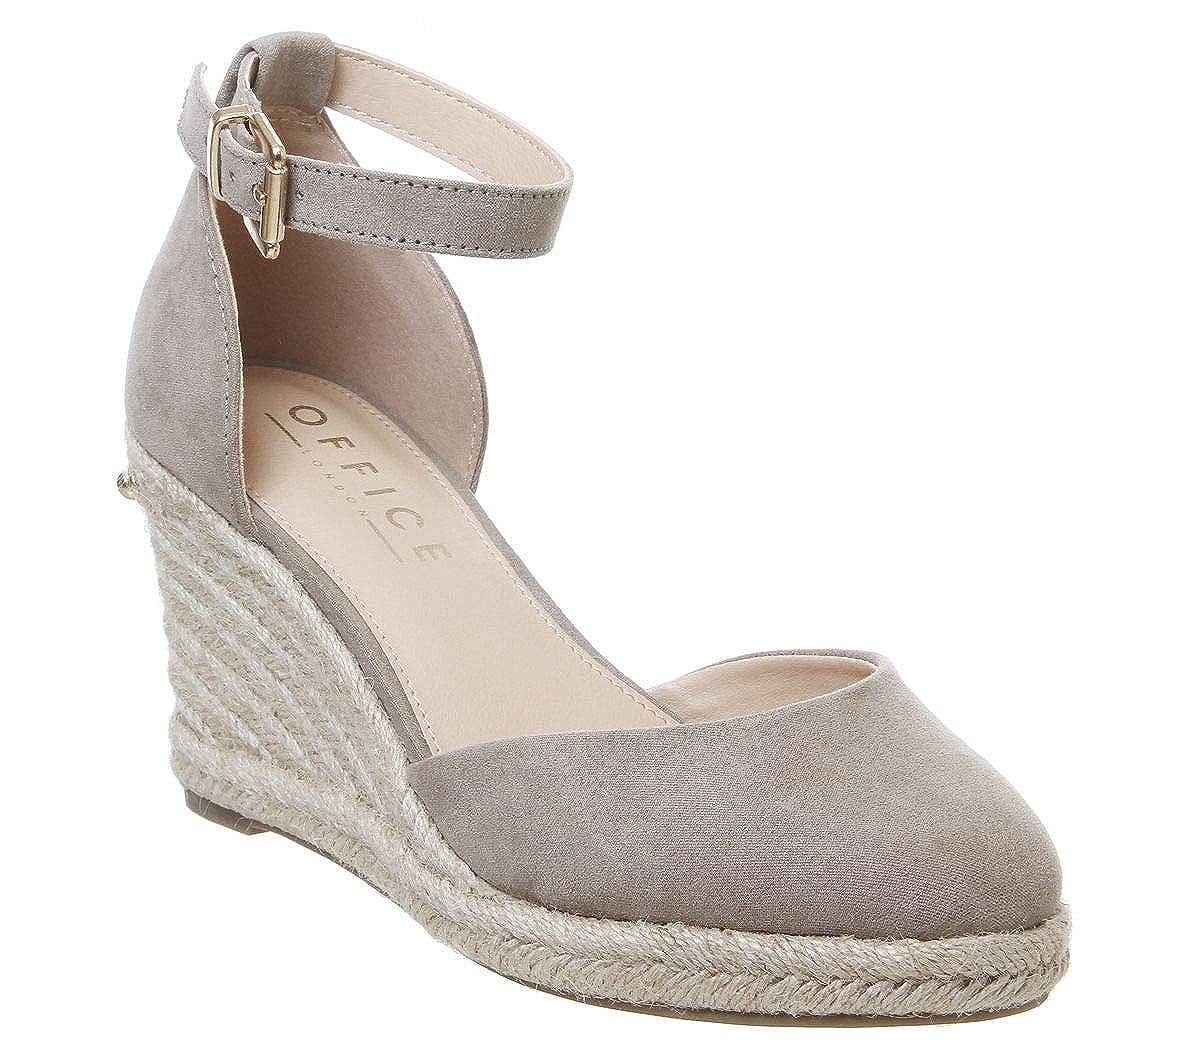 ea031e3cddc Office Marsha Closed Toe Espadrille Wedges: Amazon.co.uk: Shoes & Bags